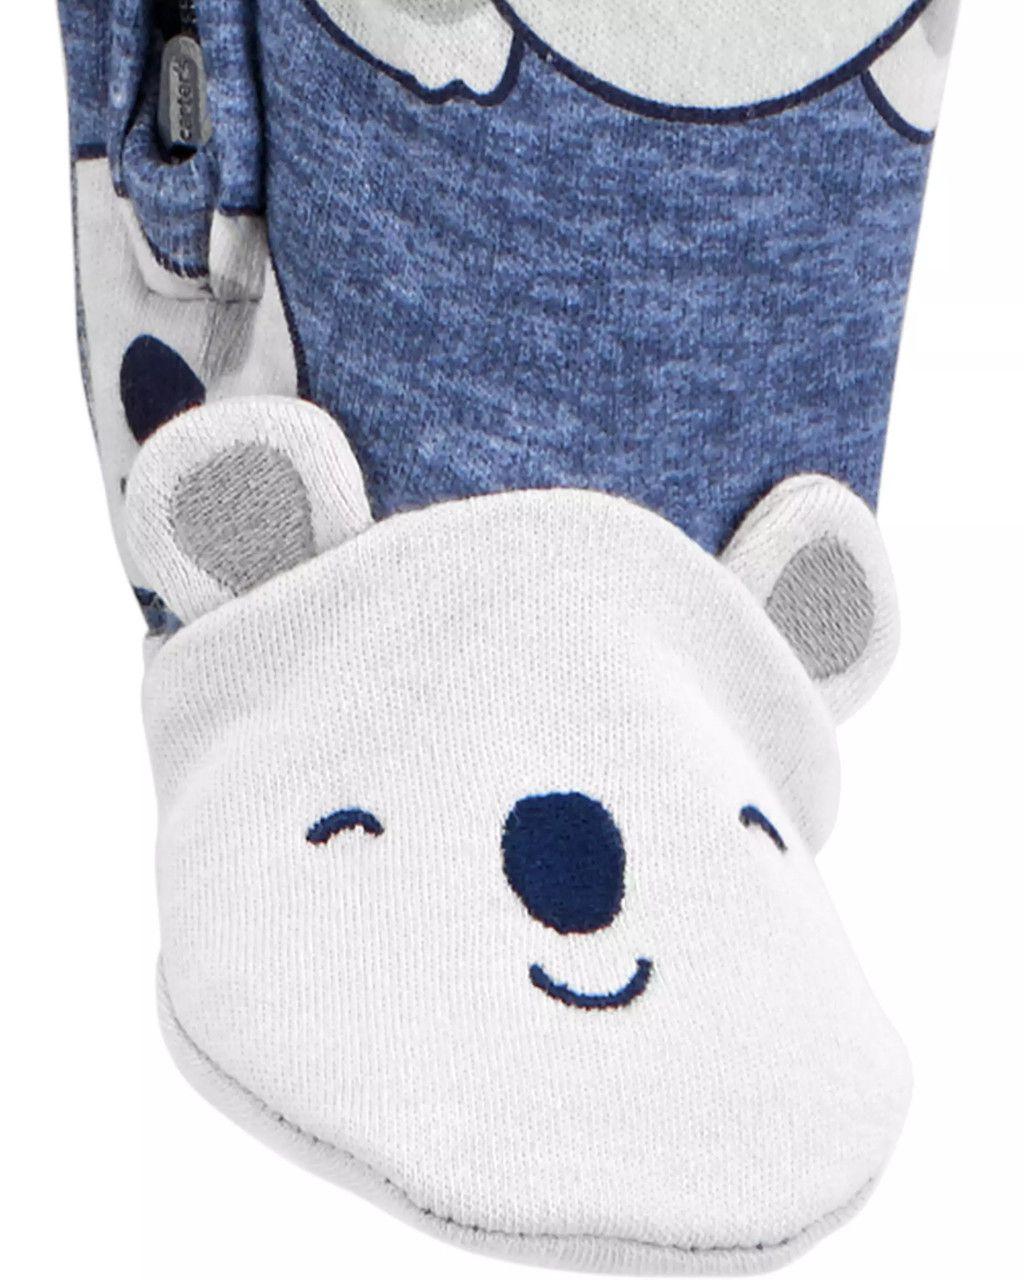 Pijama / Macacão Sleep & Play Koala Boy Carter's